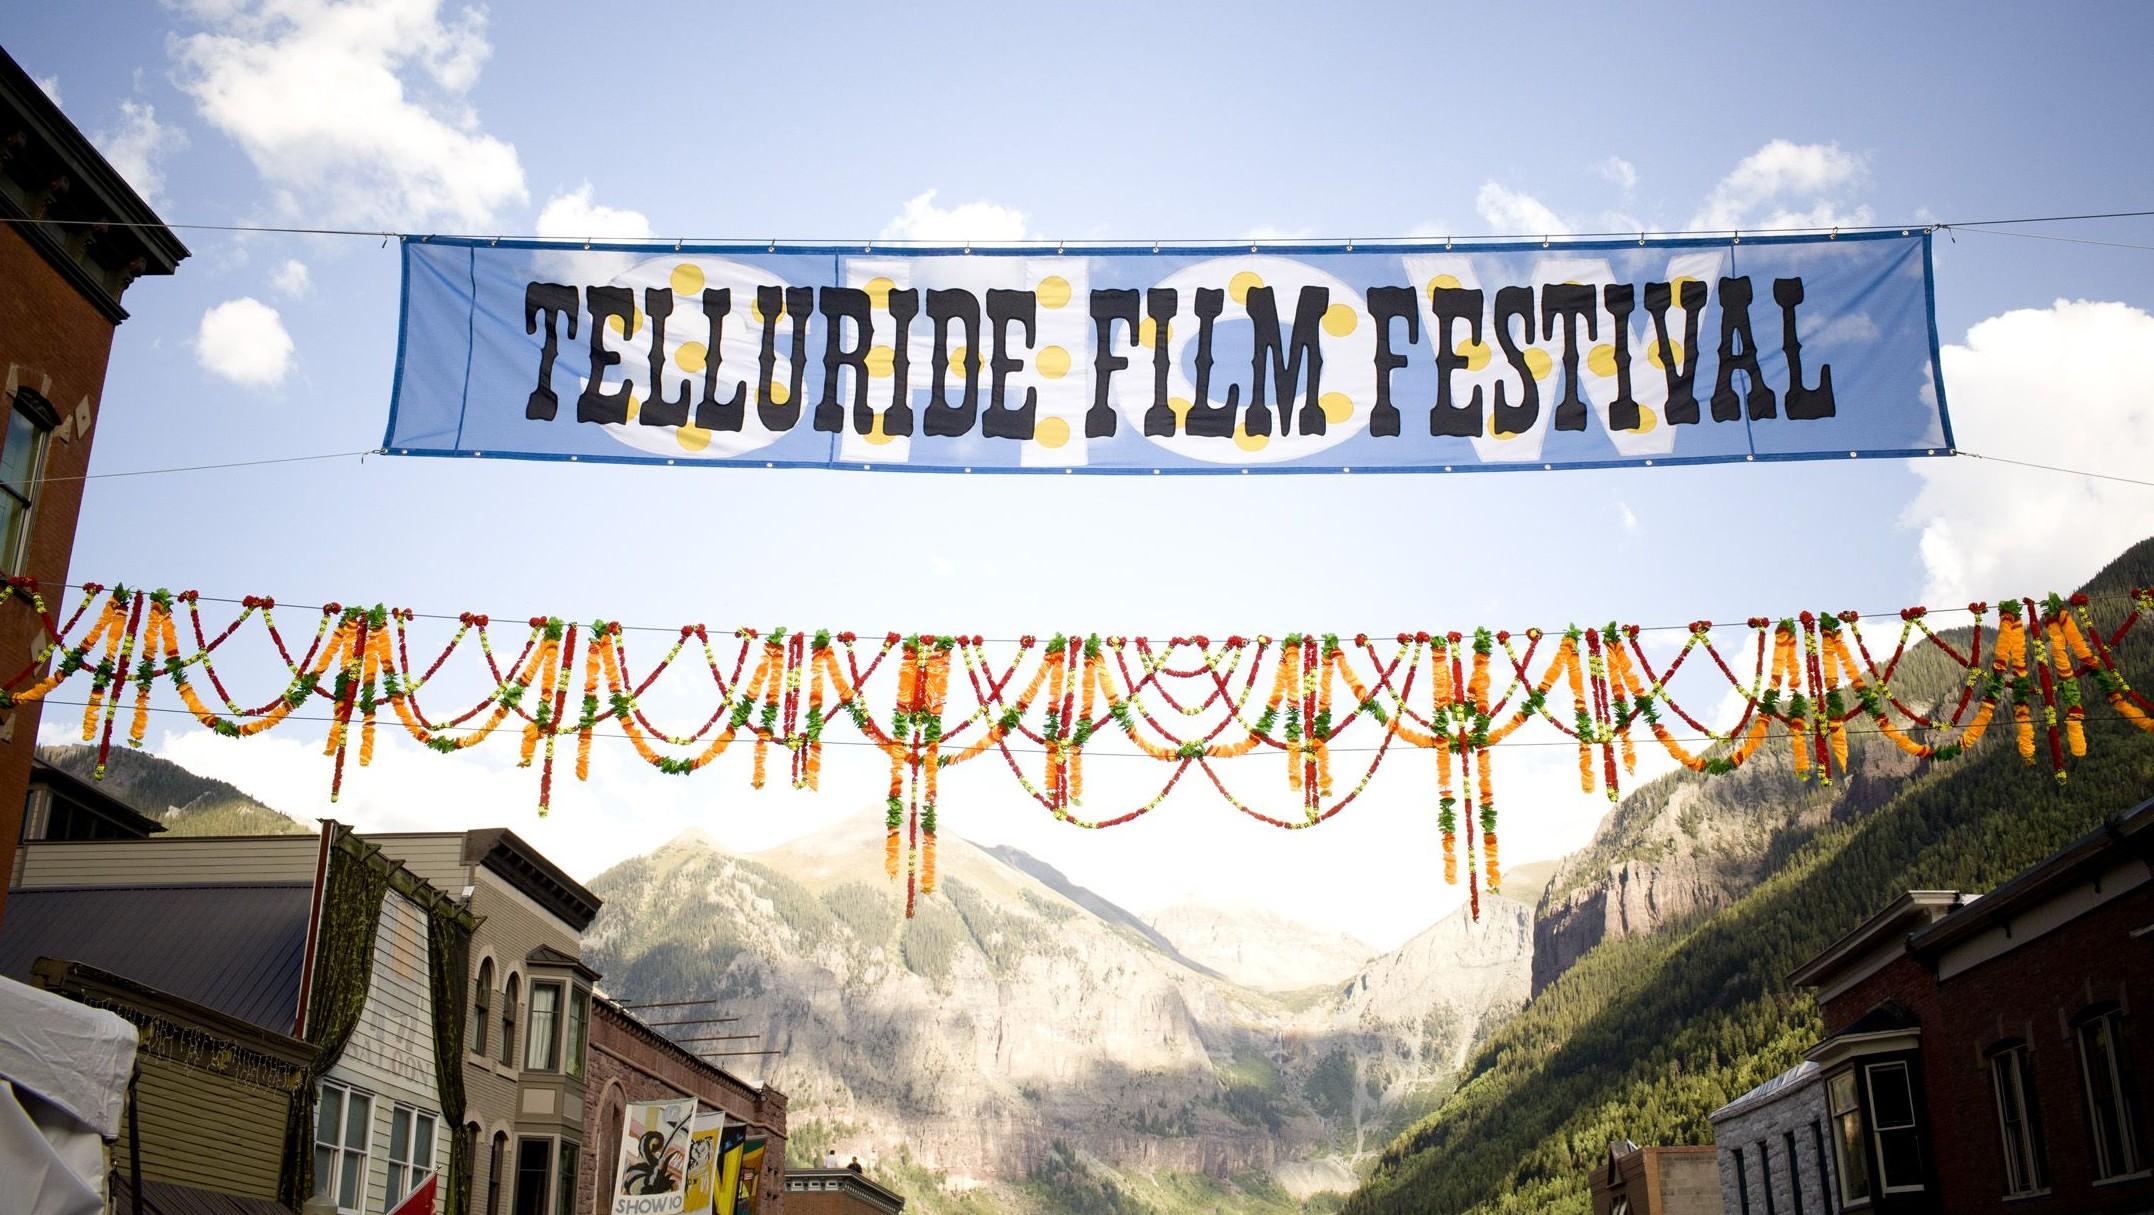 telluride film festival Le film Steve Jobs au Telluride Festival dès ce week end !